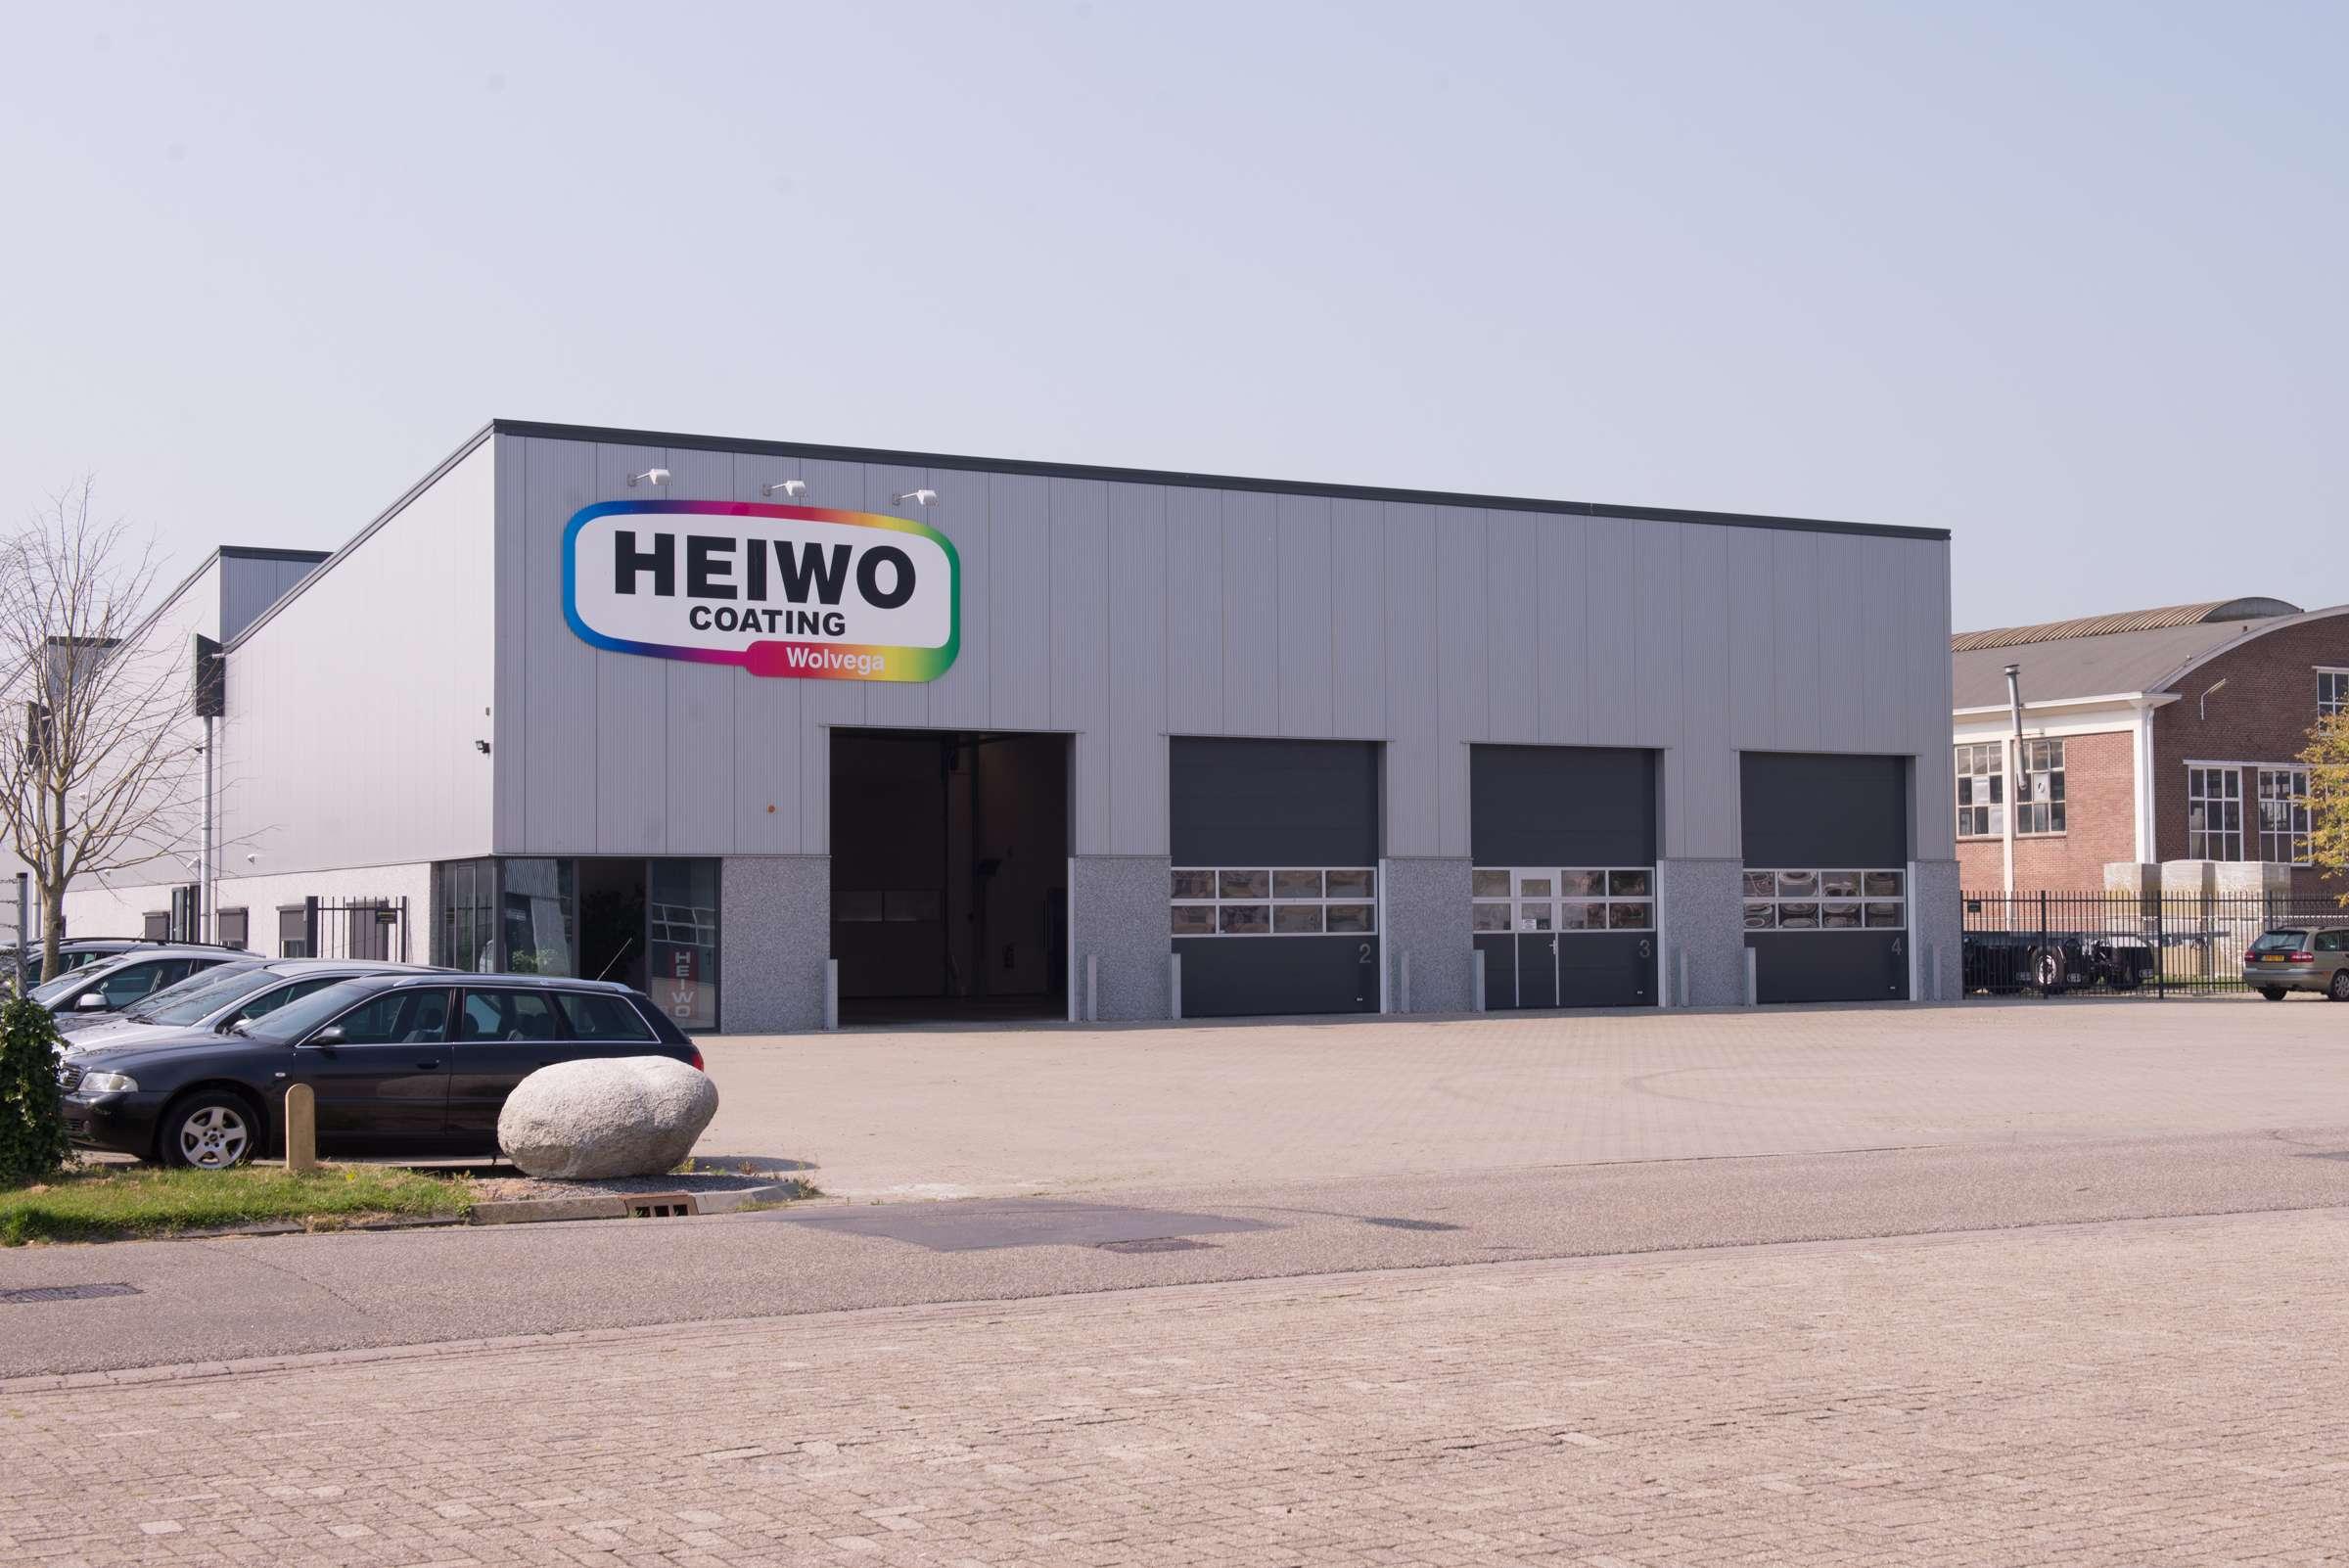 heiwo-1.jpg